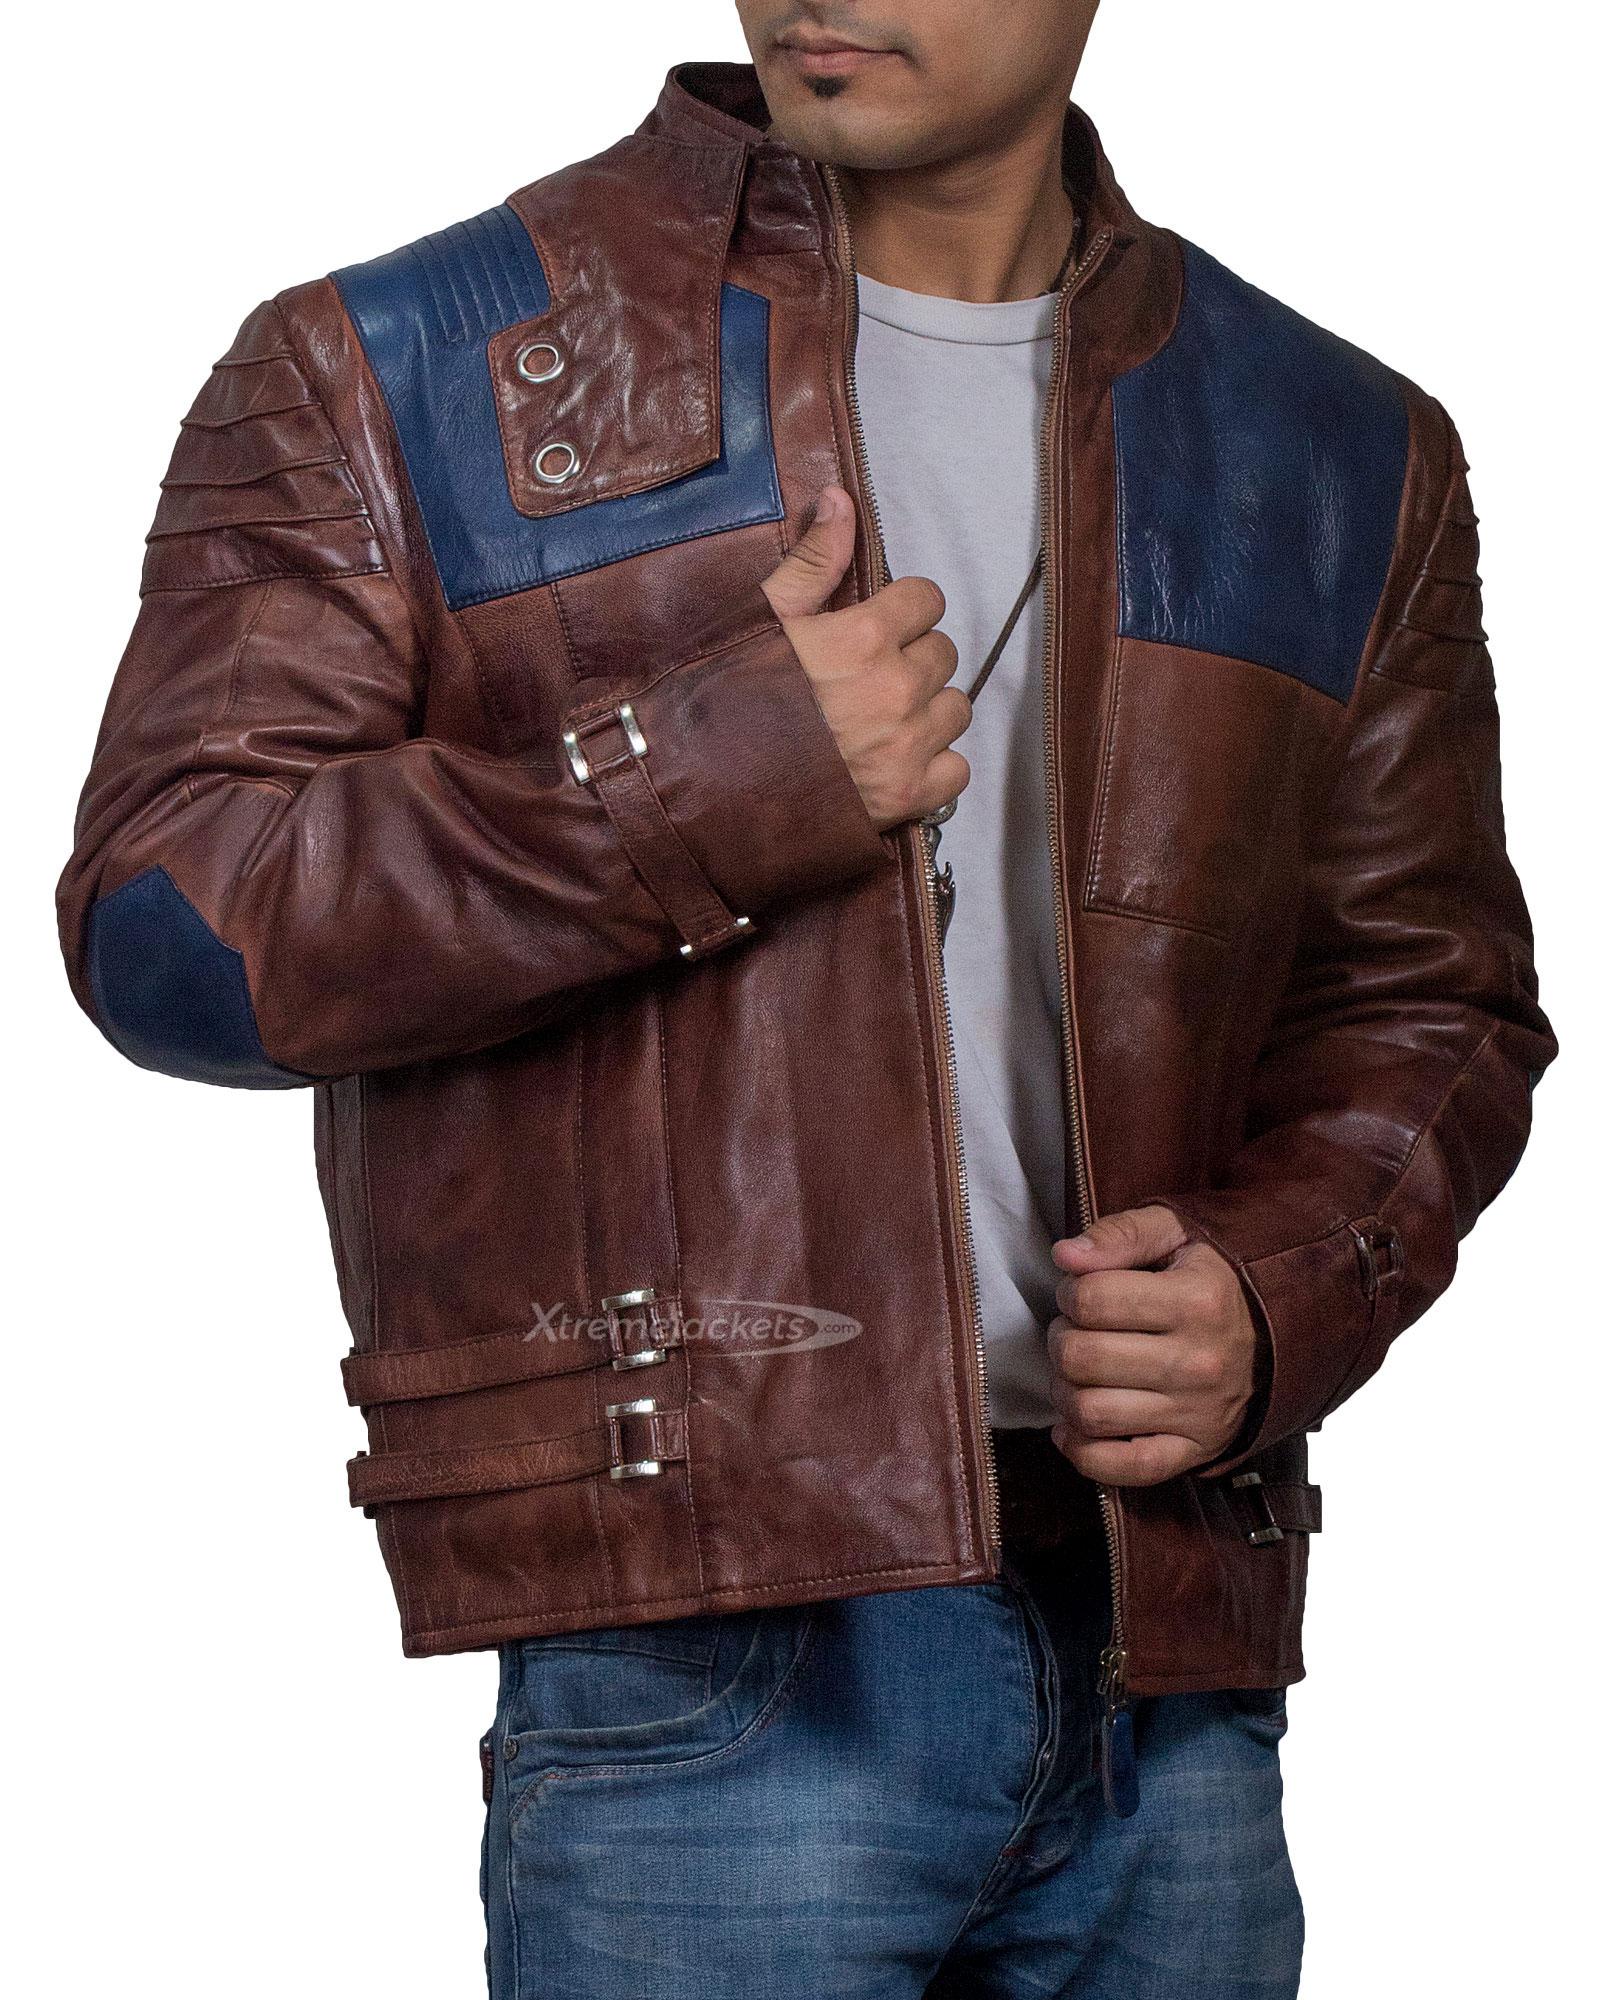 krypton-seg-el-jacket-f